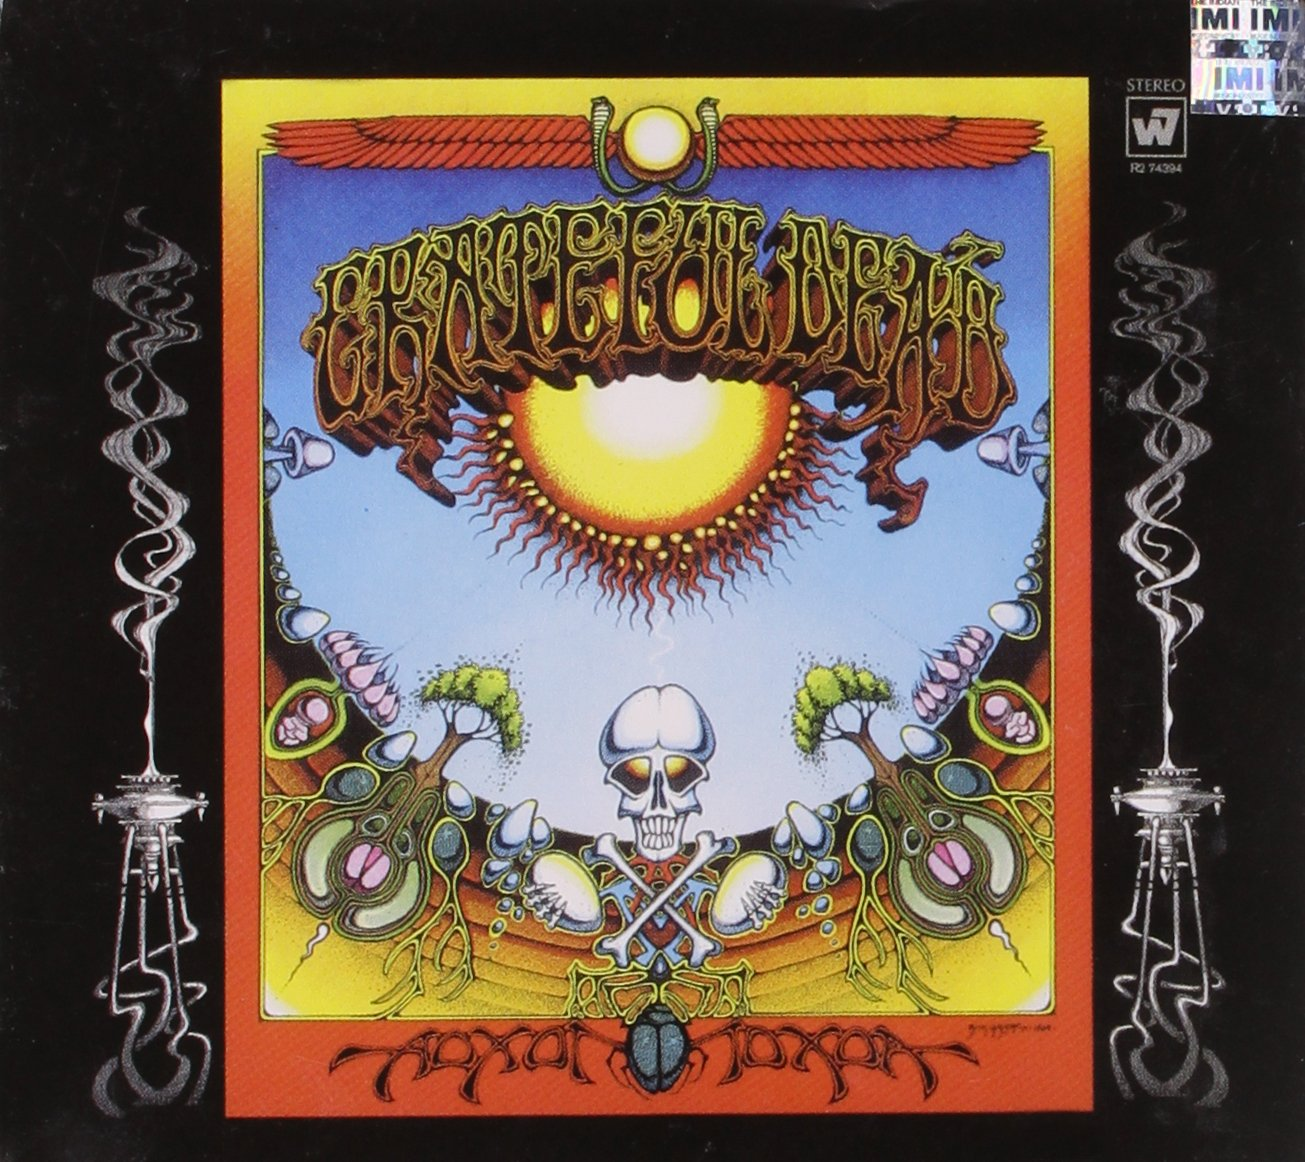 Aoxomoxoa by Grateful Dead